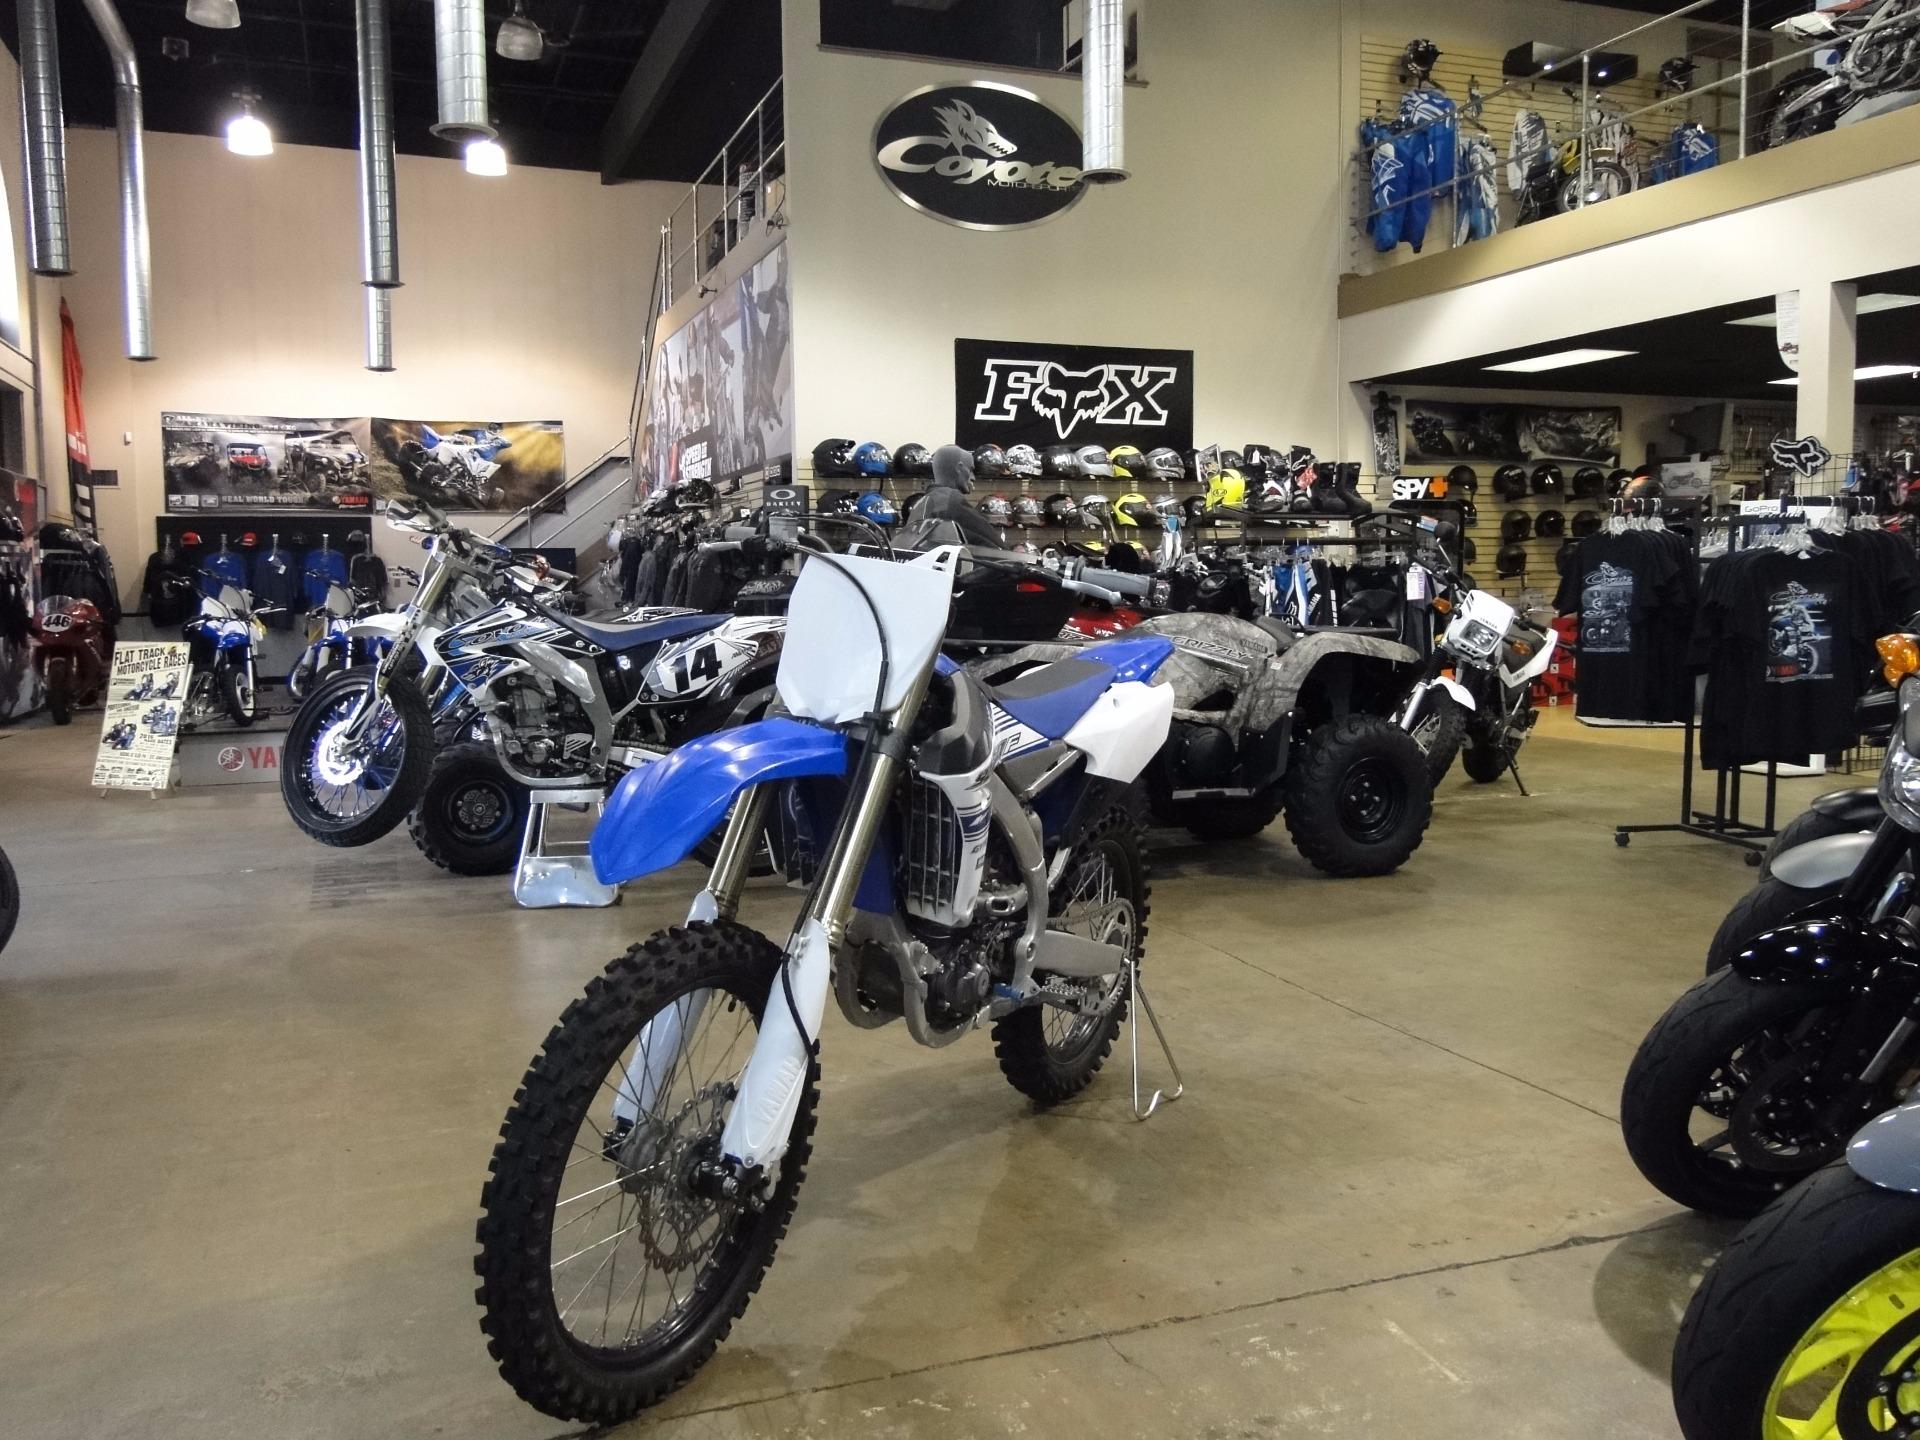 2016 Yamaha YZ250F in Denver, Colorado